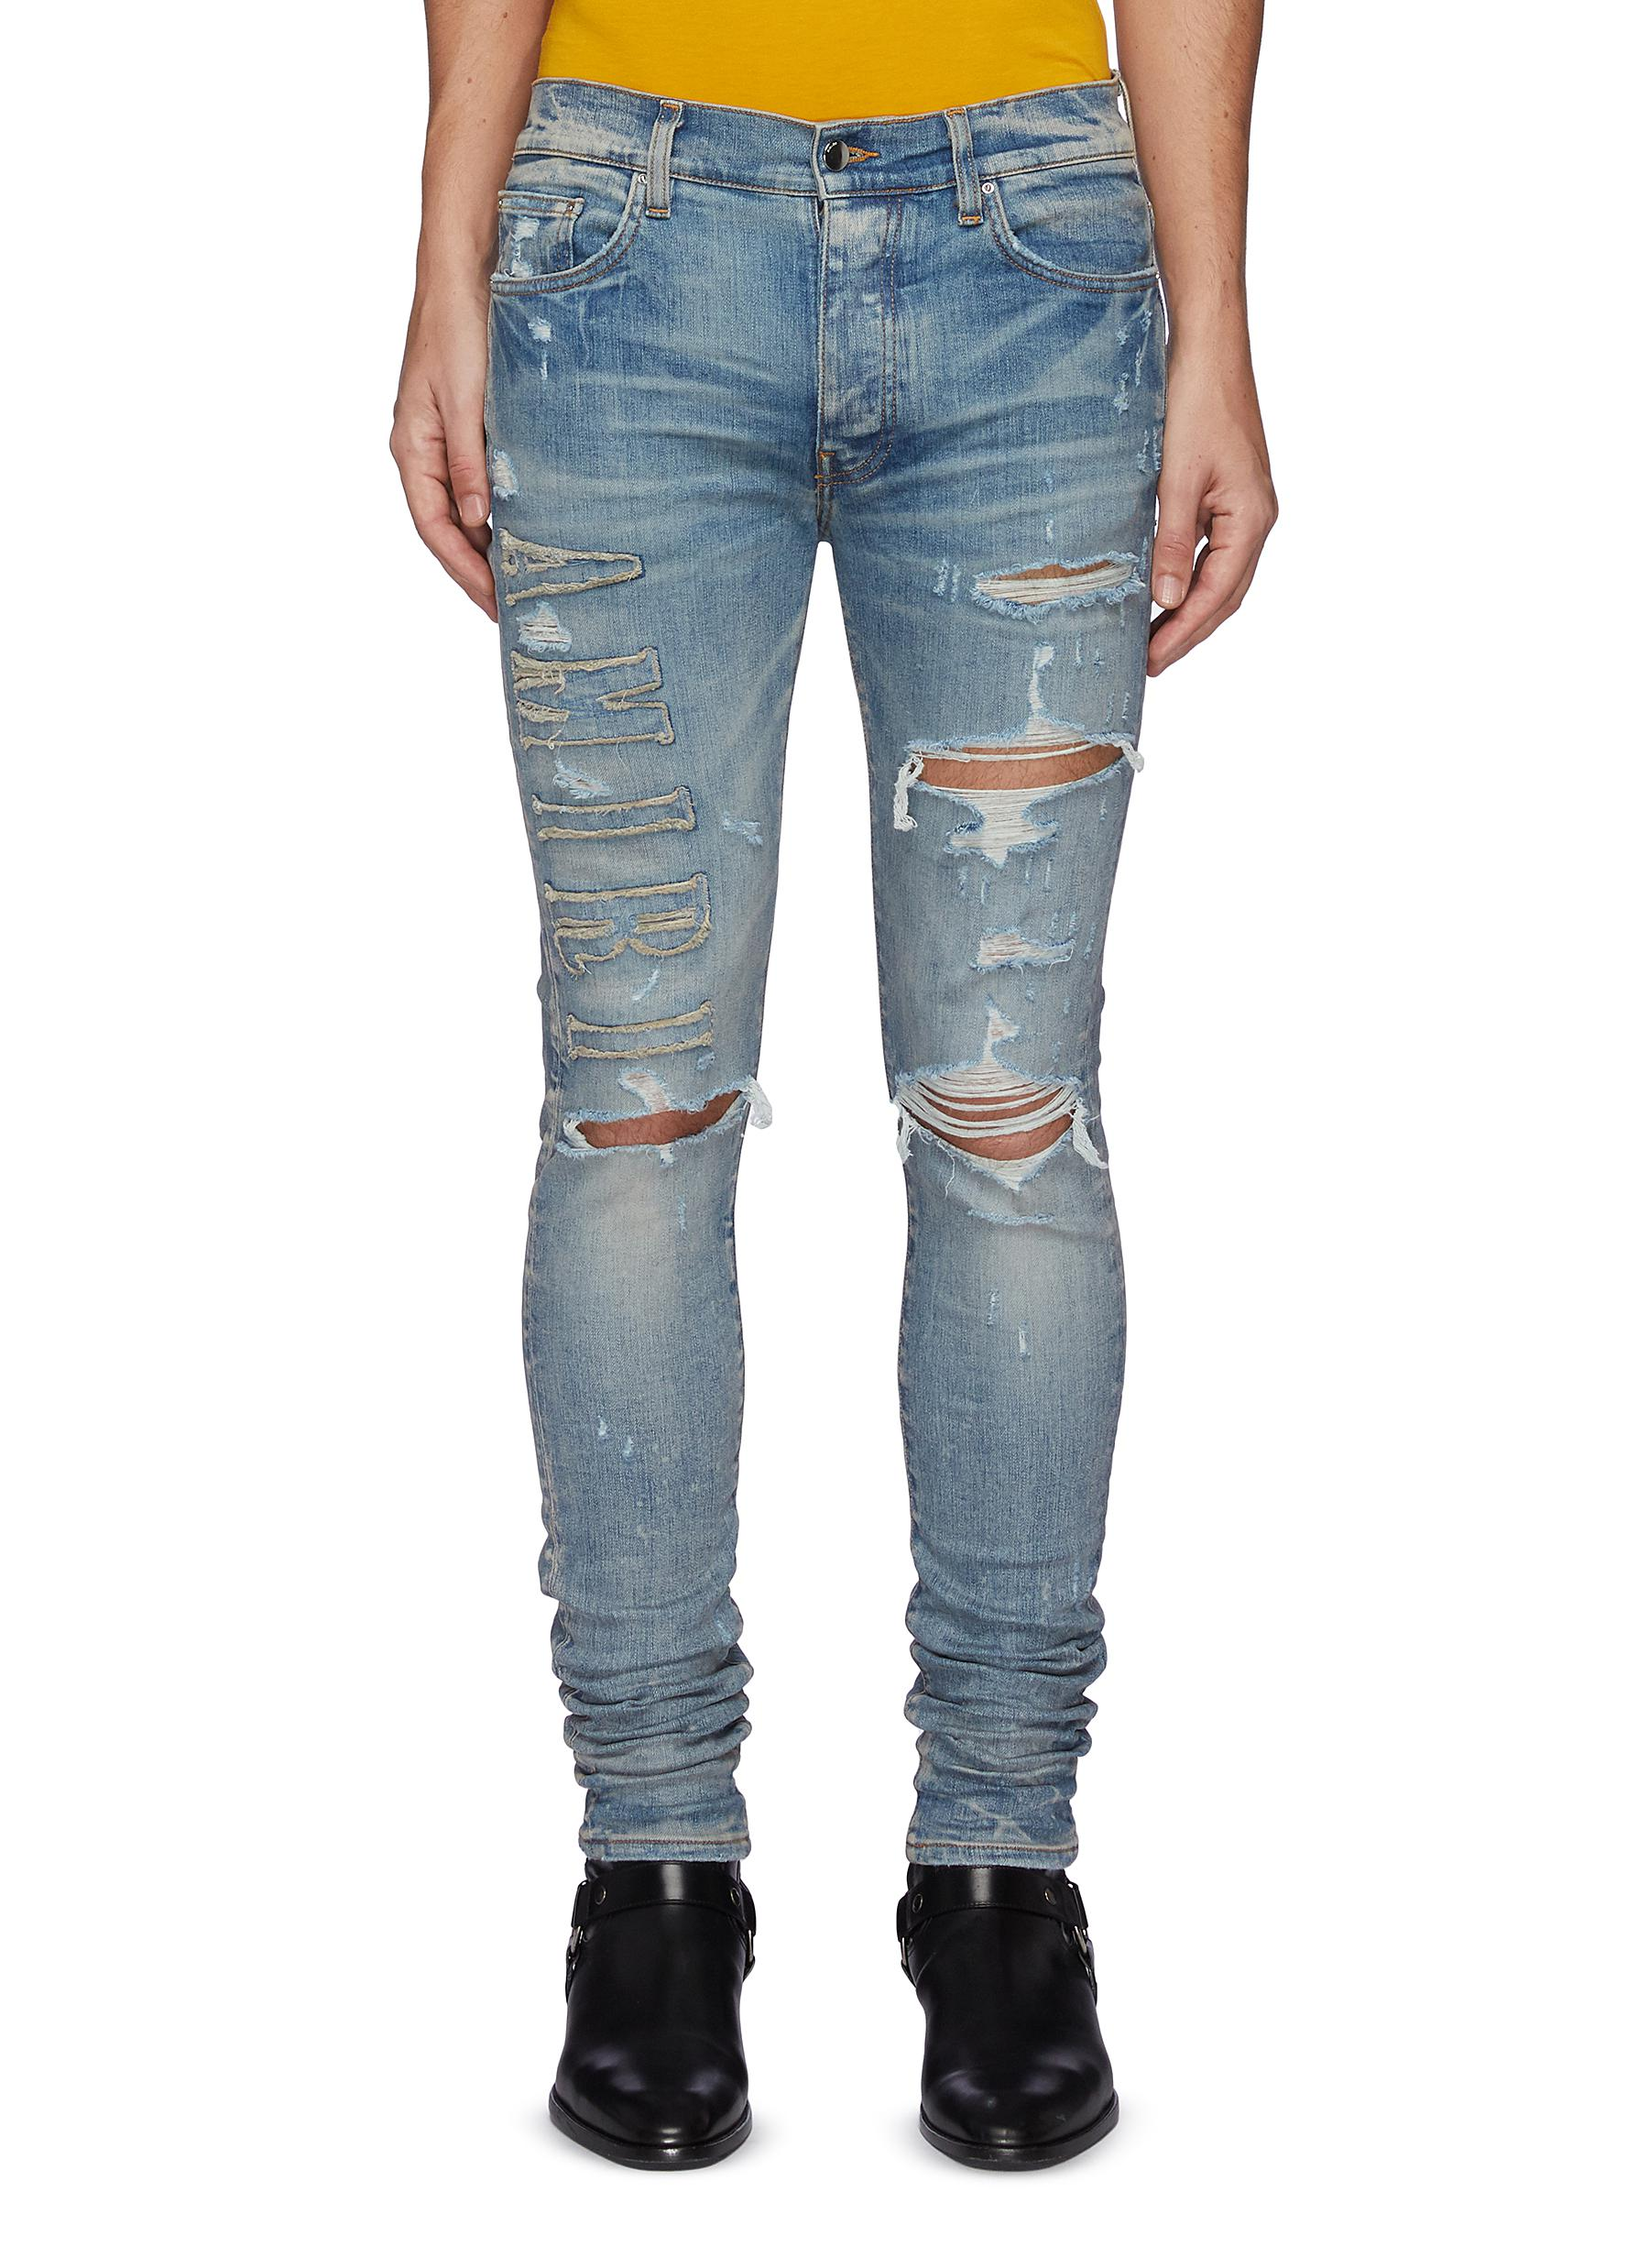 Logo Appliqued Ripped Slim Fit Light Wash Jeans